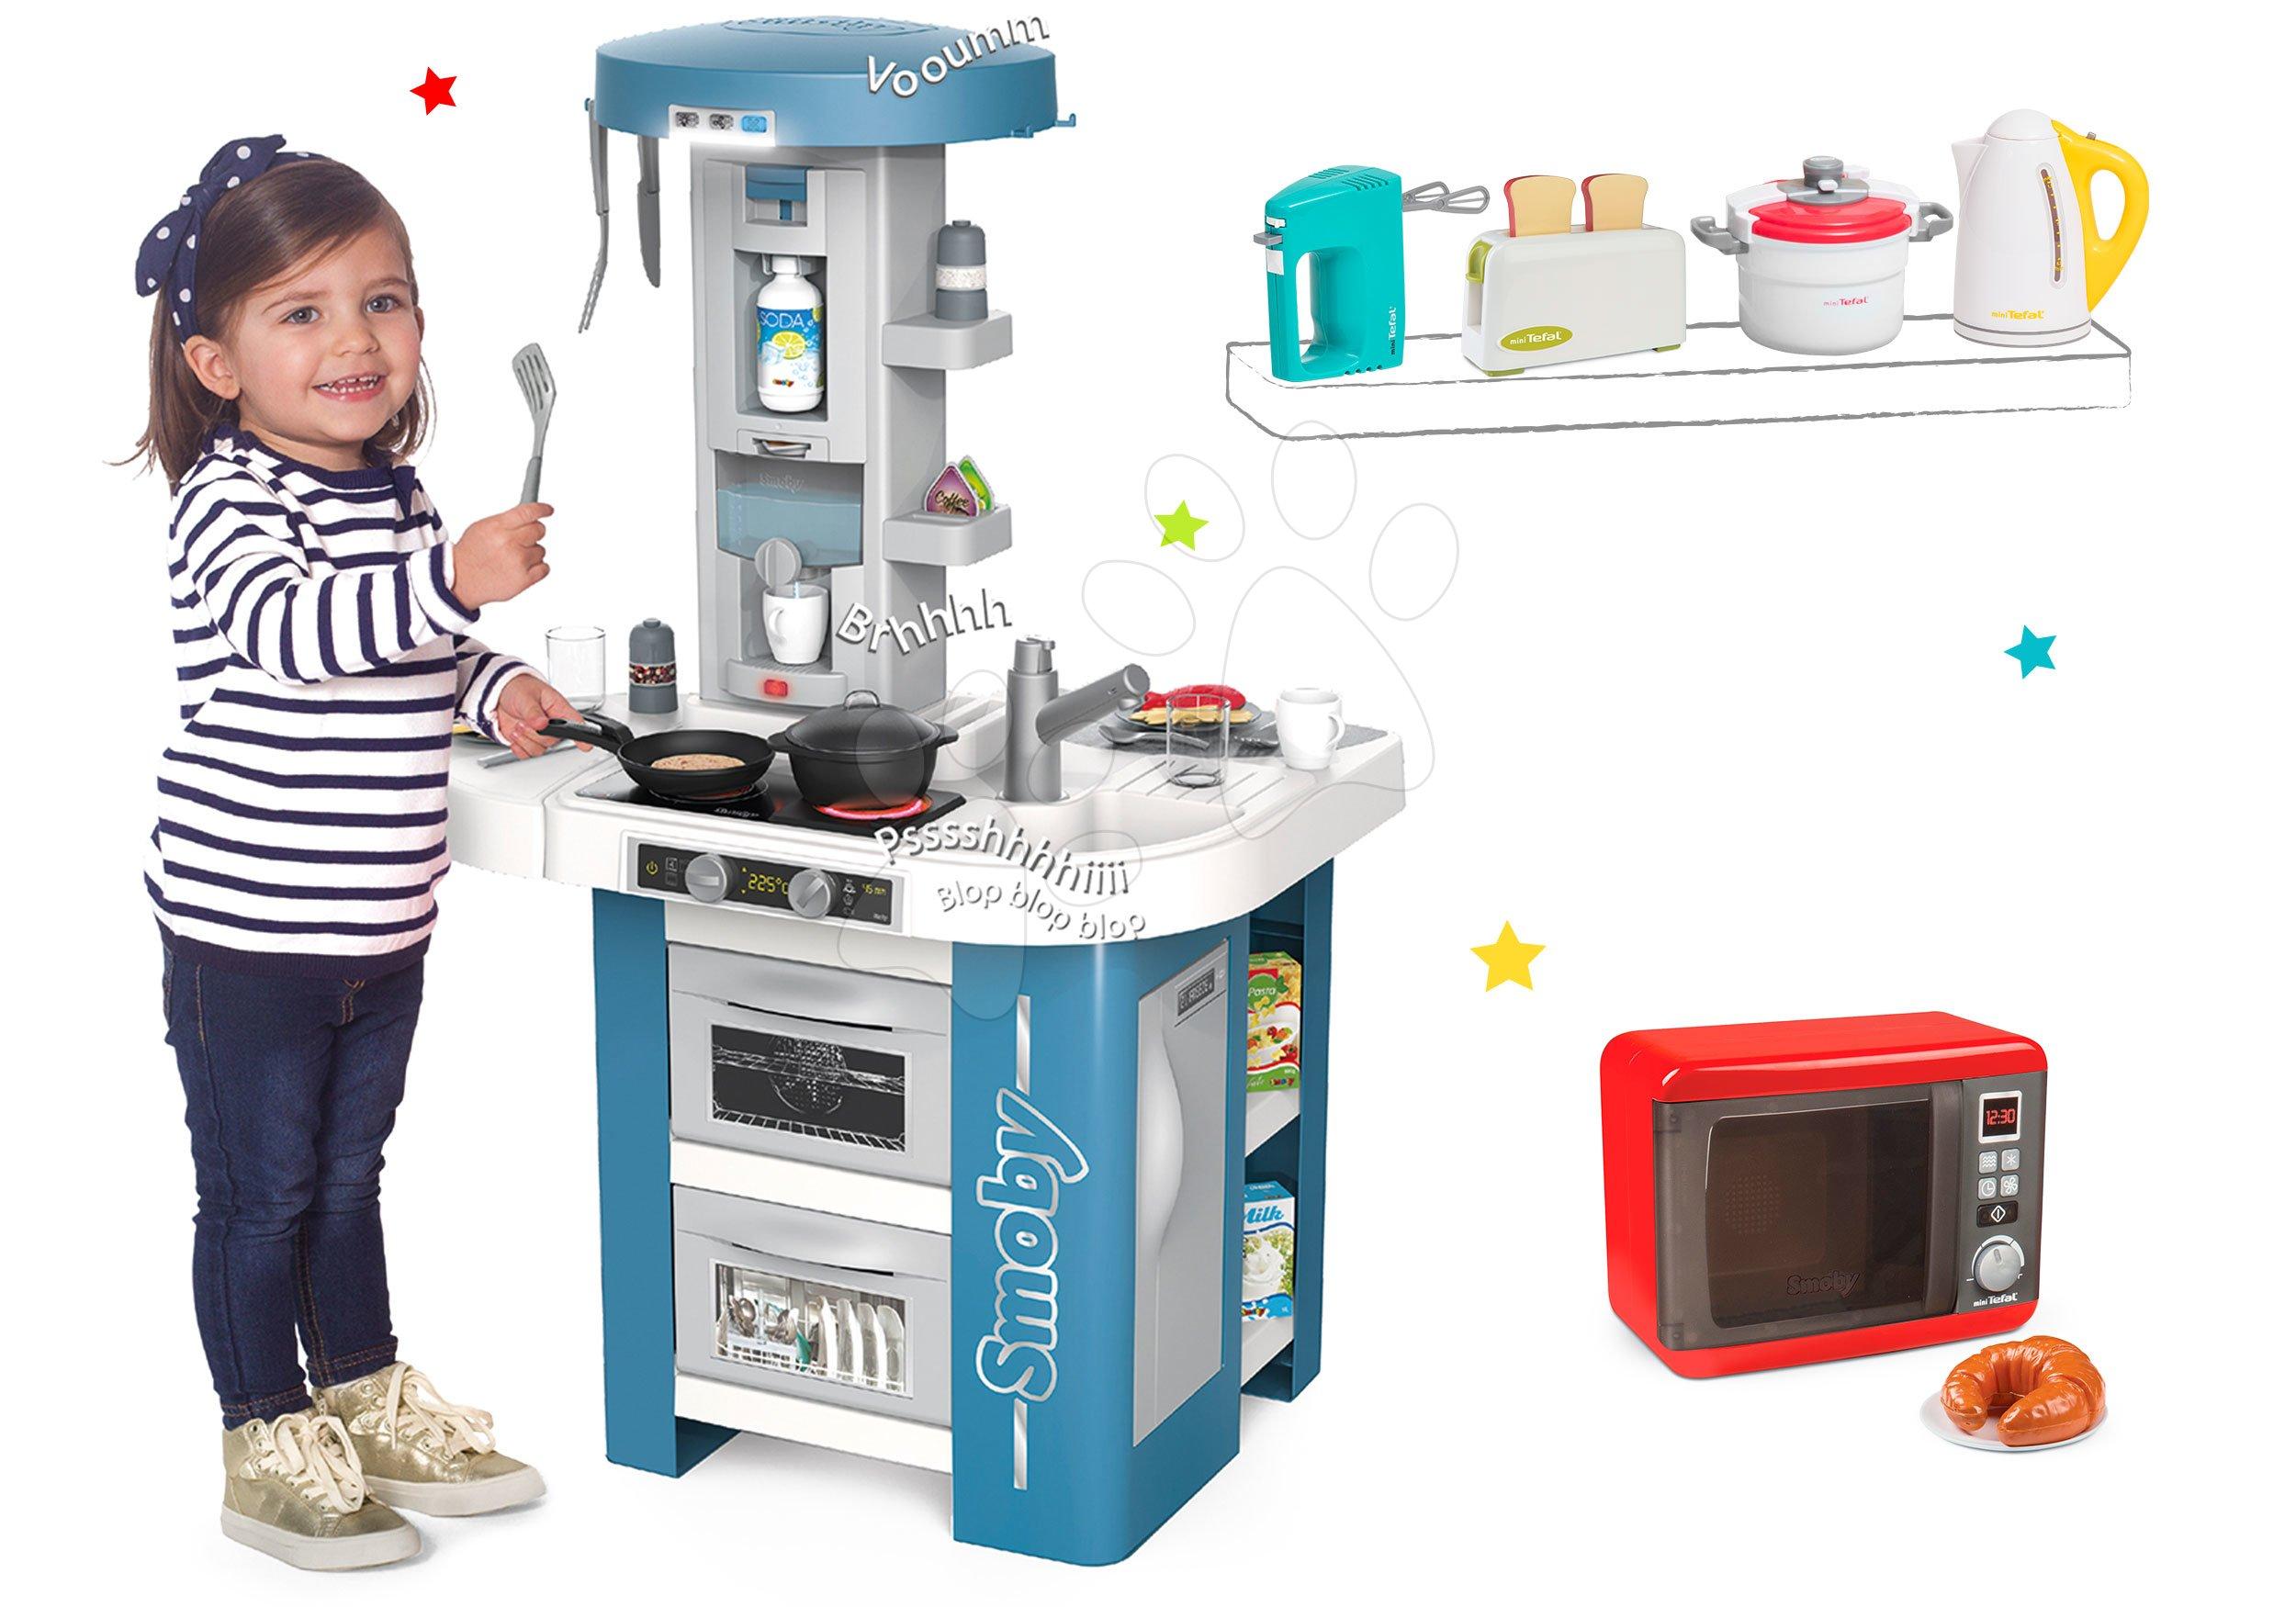 Set kuchynka s technickým vybavením Tech Edition Smoby elektronická s mikrovlnkou a so 4 Tefal spotrebičmi